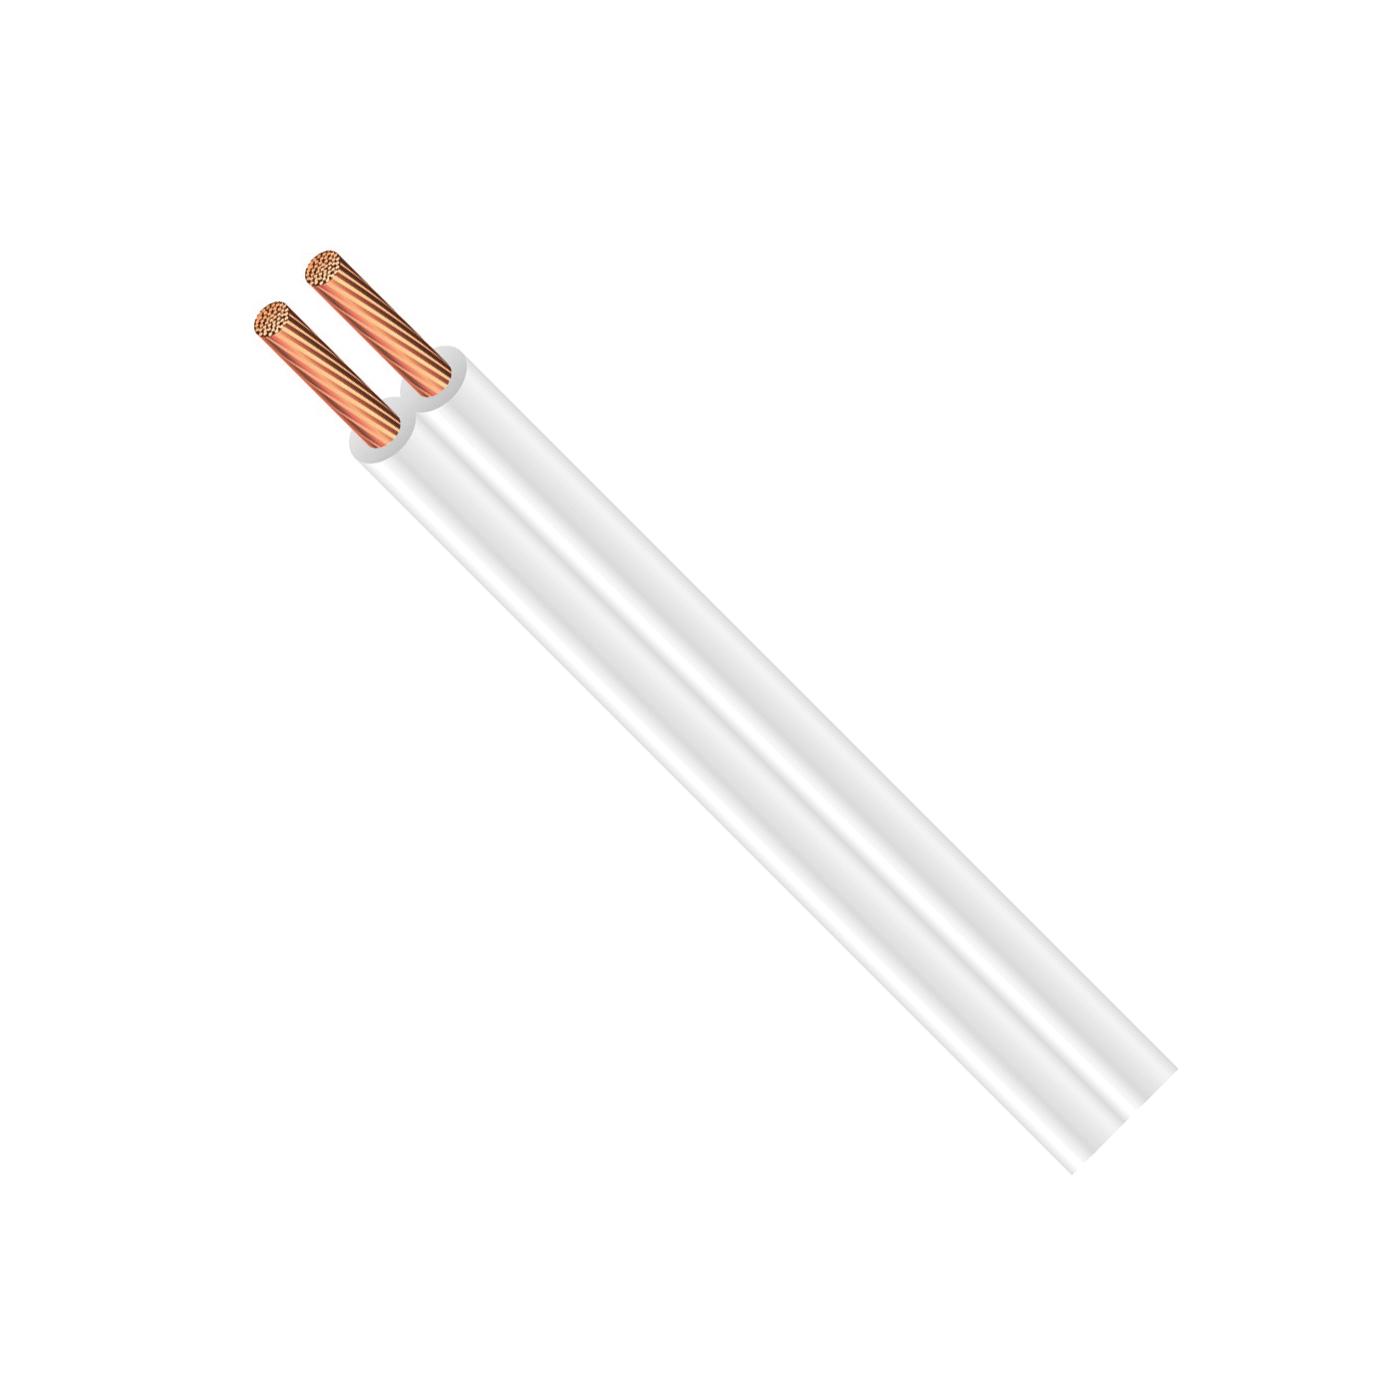 Picture of CCI 0478 Building Wire, 18 AWG Wire, 2-Conductor, Copper Conductor, PVC Insulation, White Sheath, 250 ft L